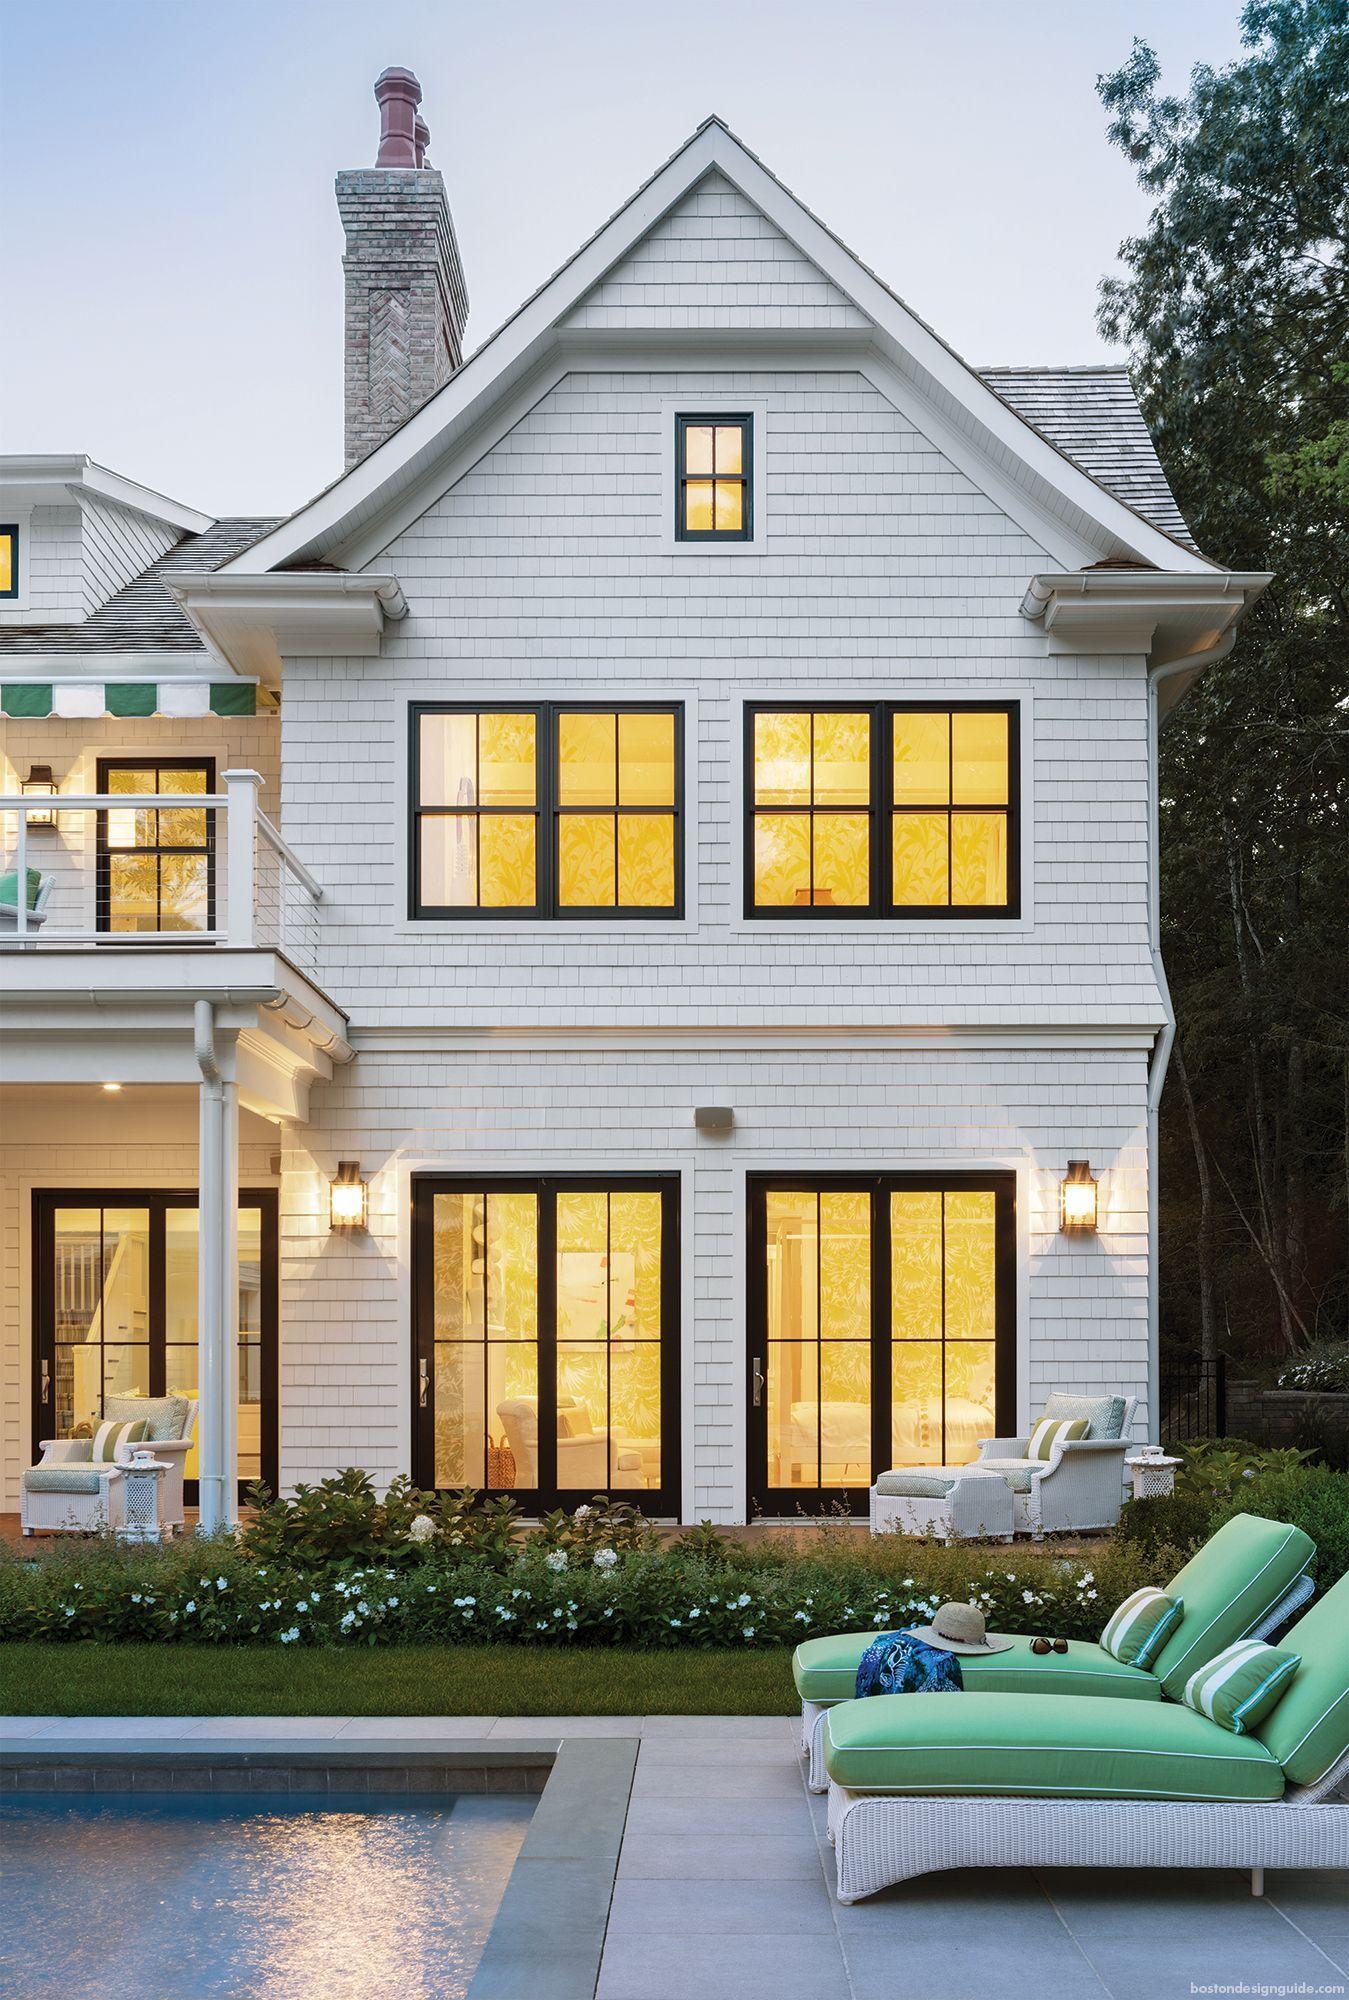 22 simple modern dream home ideas latest 2019 marvin on most popular modern dream house exterior design ideas the best destination id=85911